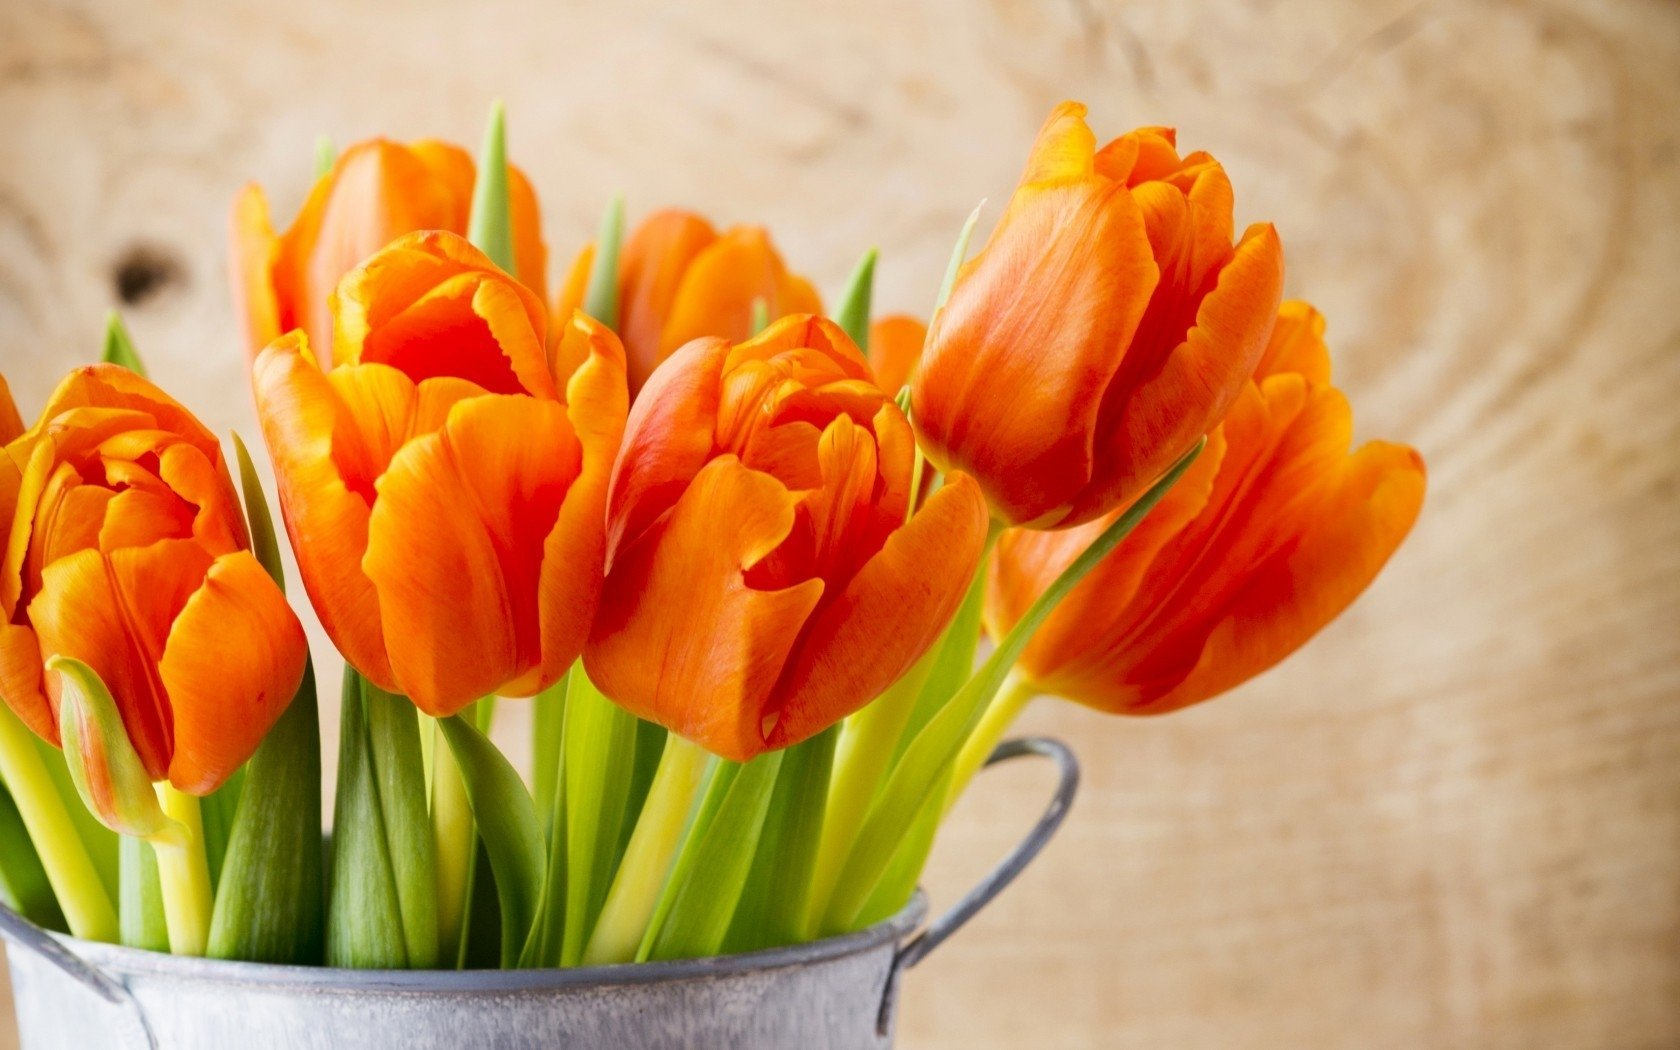 Free download flower bouquet wallpaper id180090 hd 1680x1050 for pc izmirmasajfo